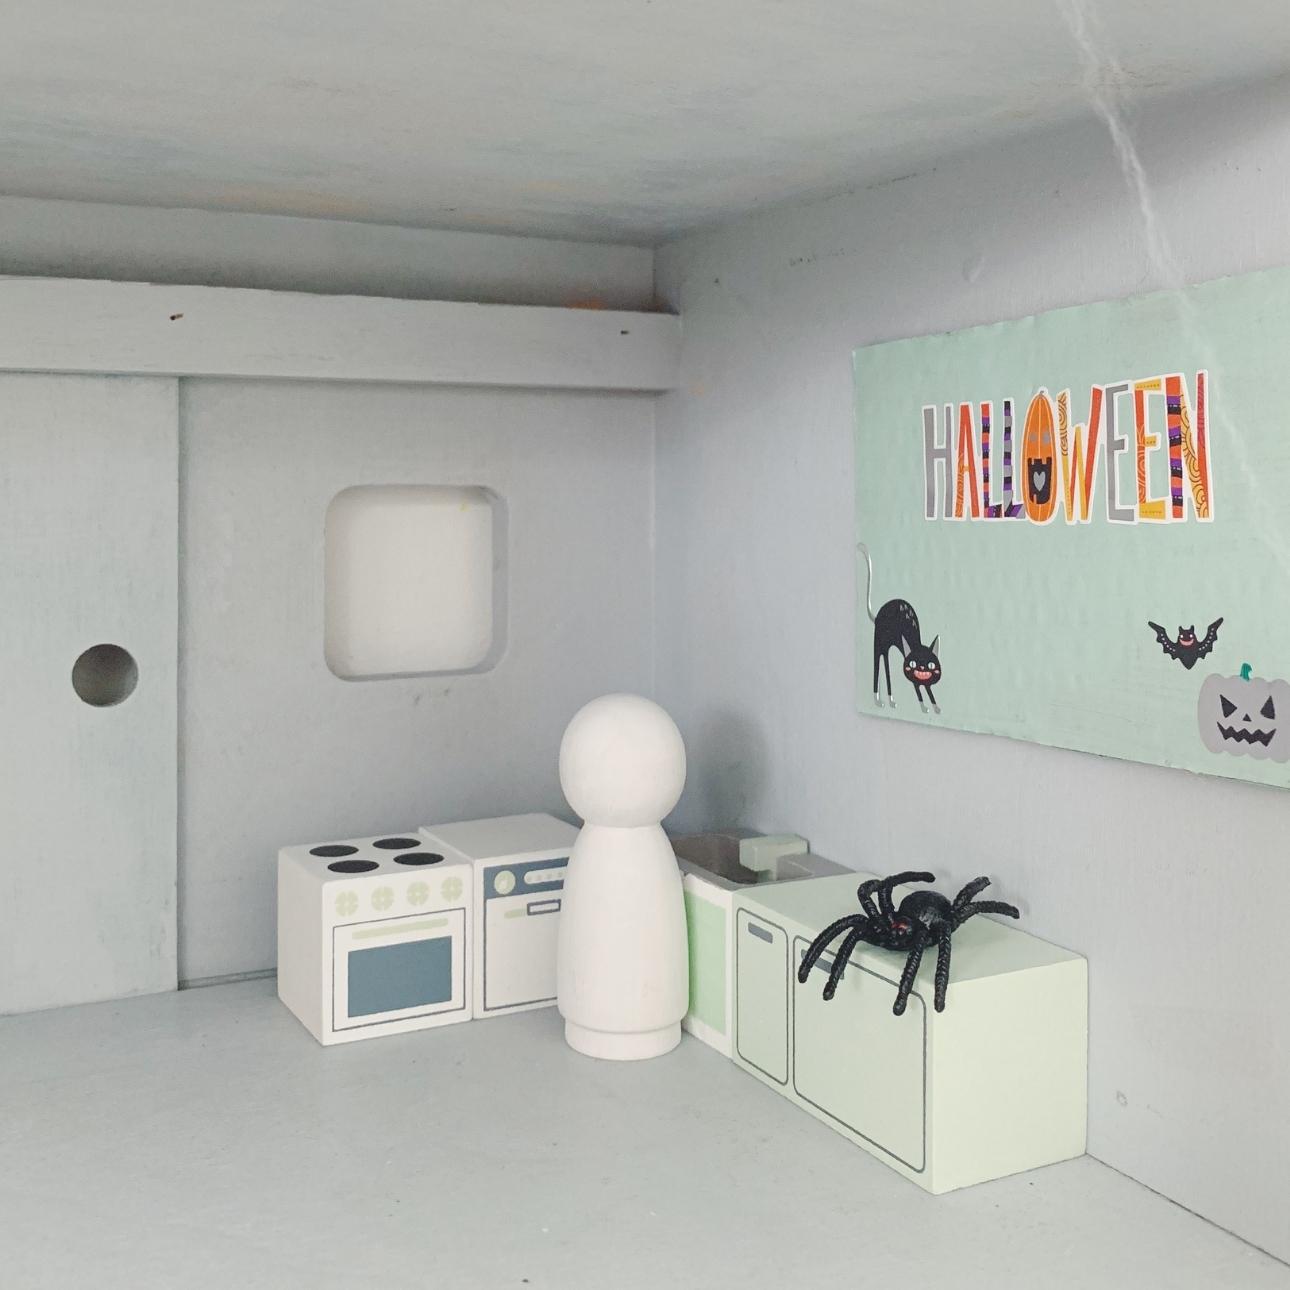 spookhuis spoken poppenhuis (2)